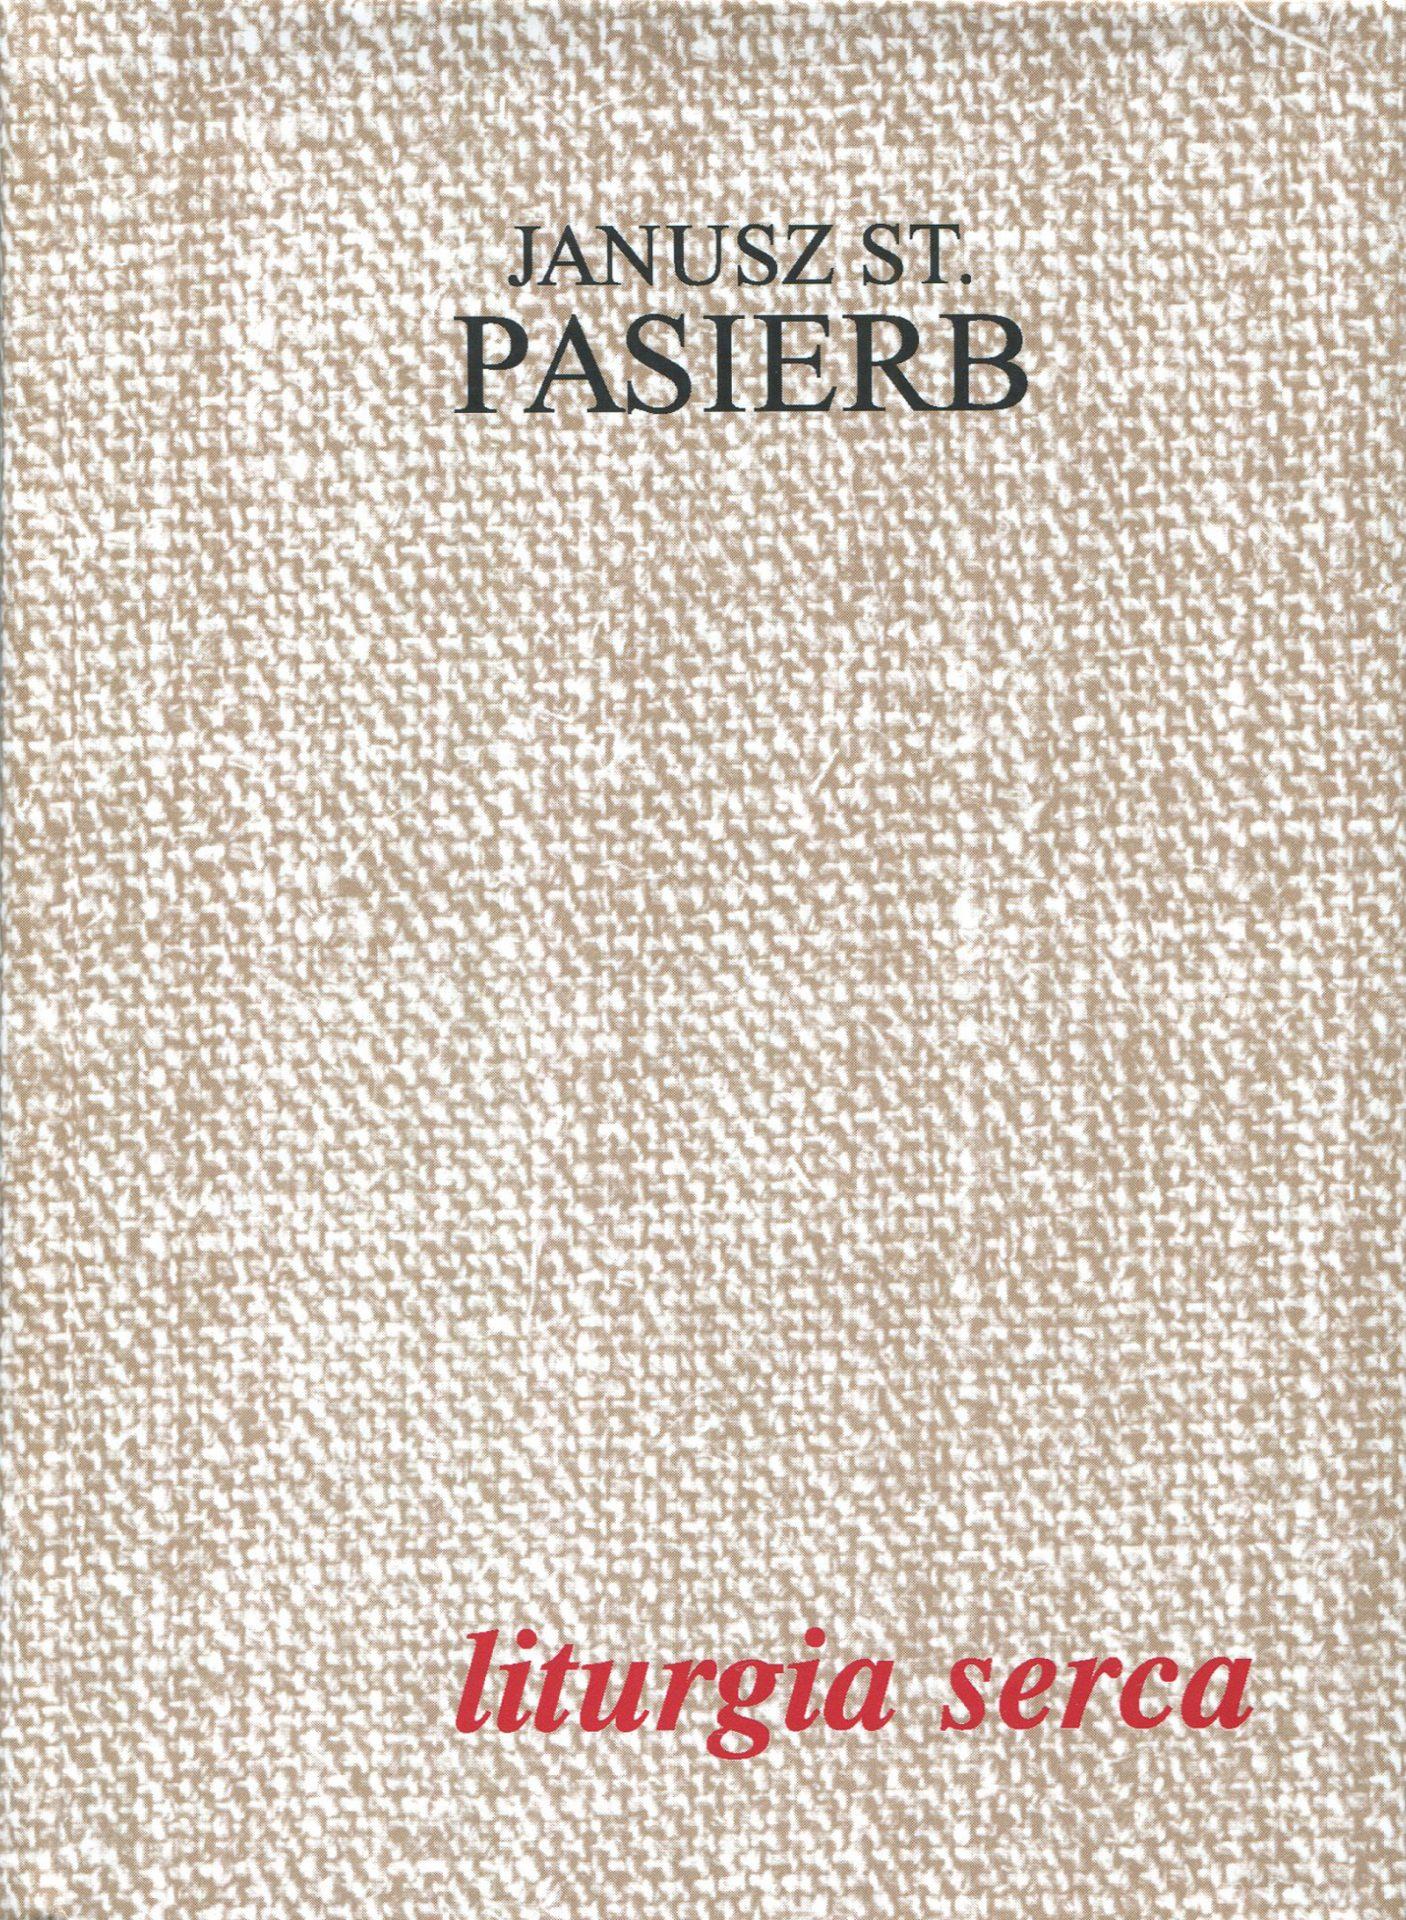 Liturgia serca - Janusz St. Pasierb